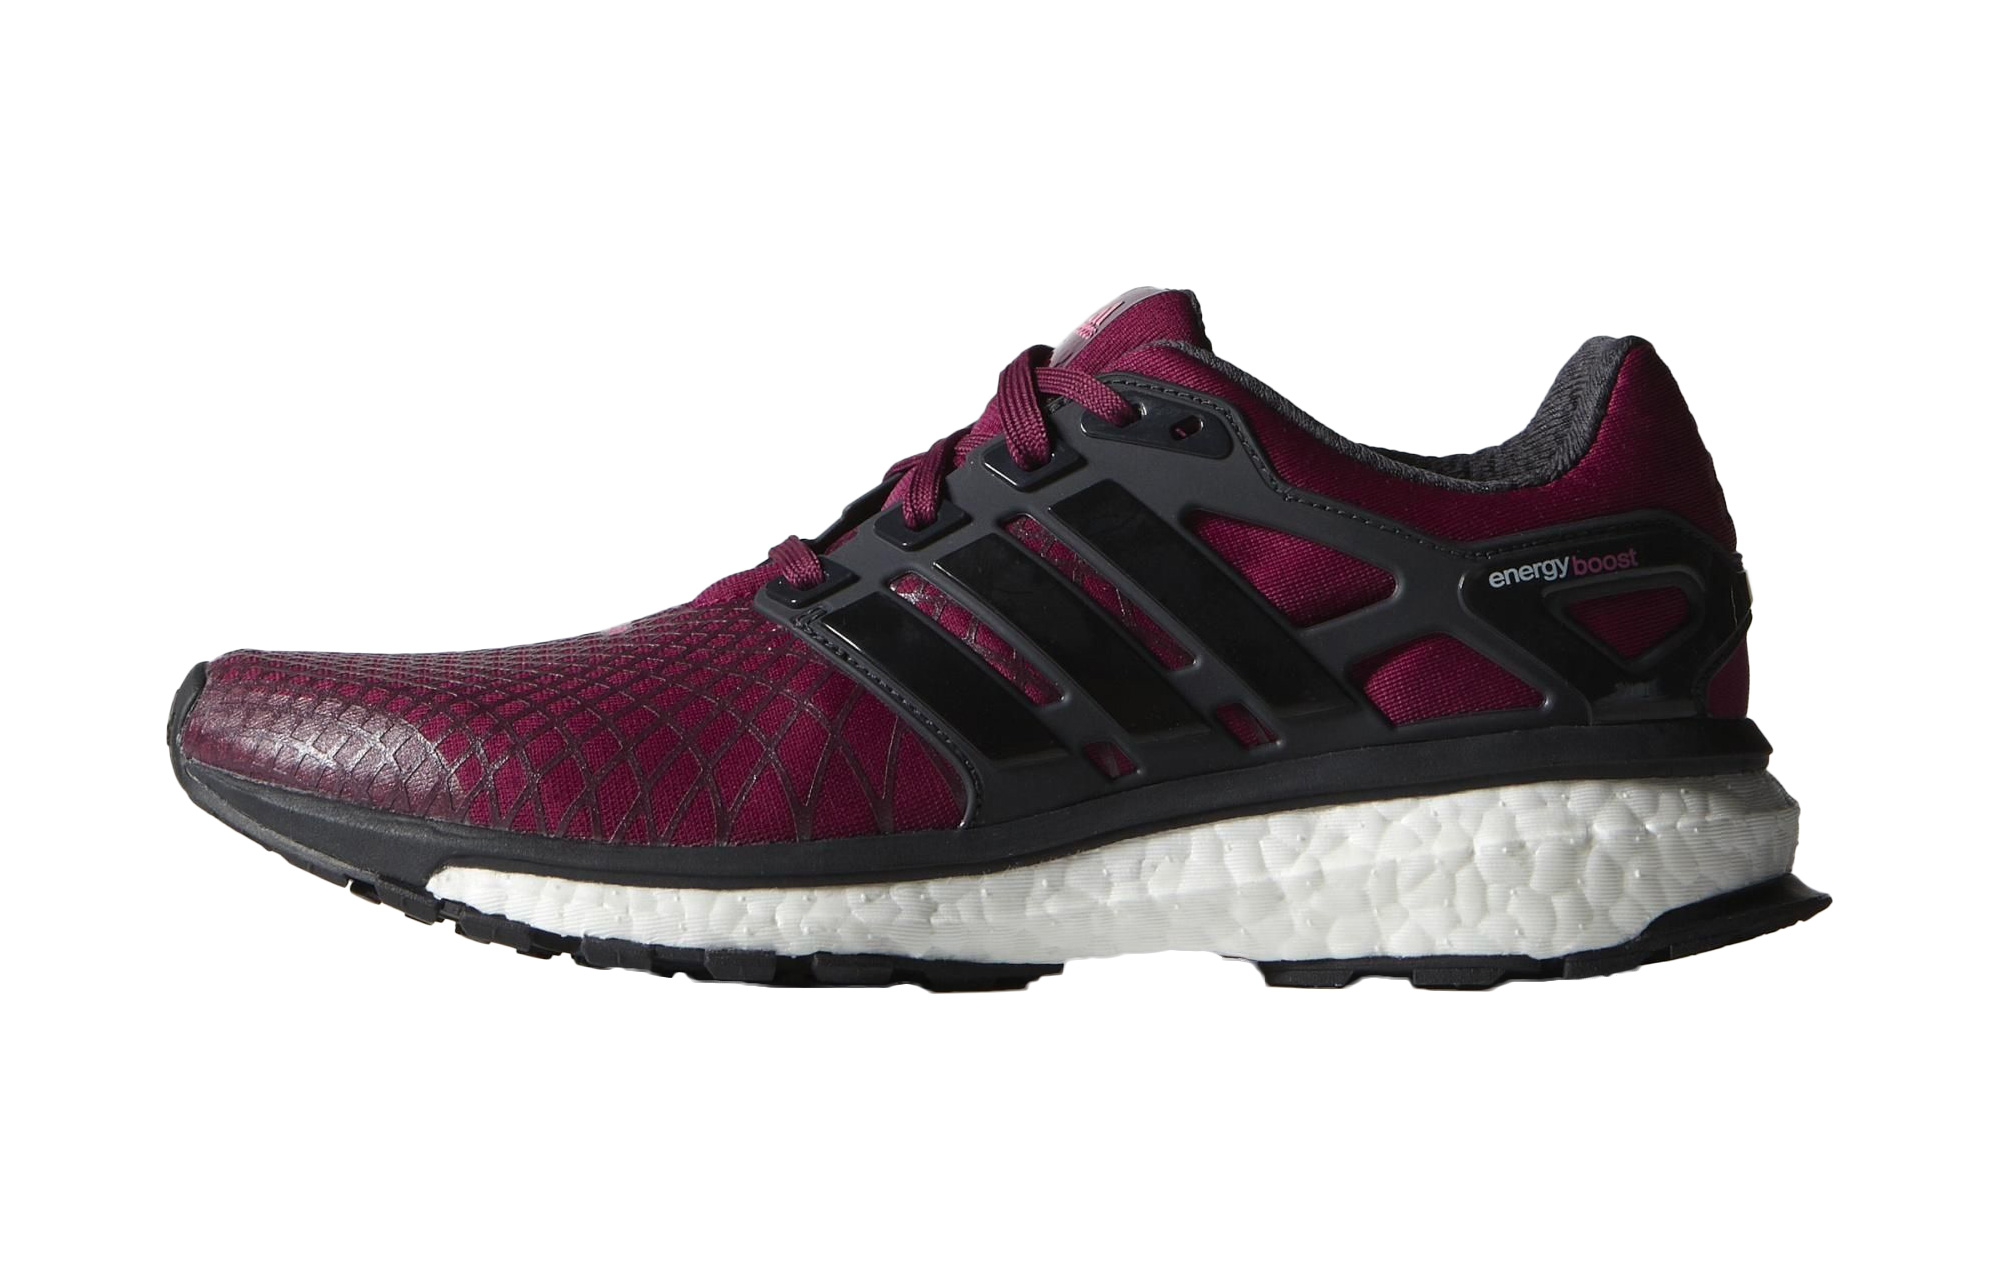 quality design 03ec8 89afa Zapatillas Adidas Energy Boost 2.0 ATR Mujer Negro Violeta